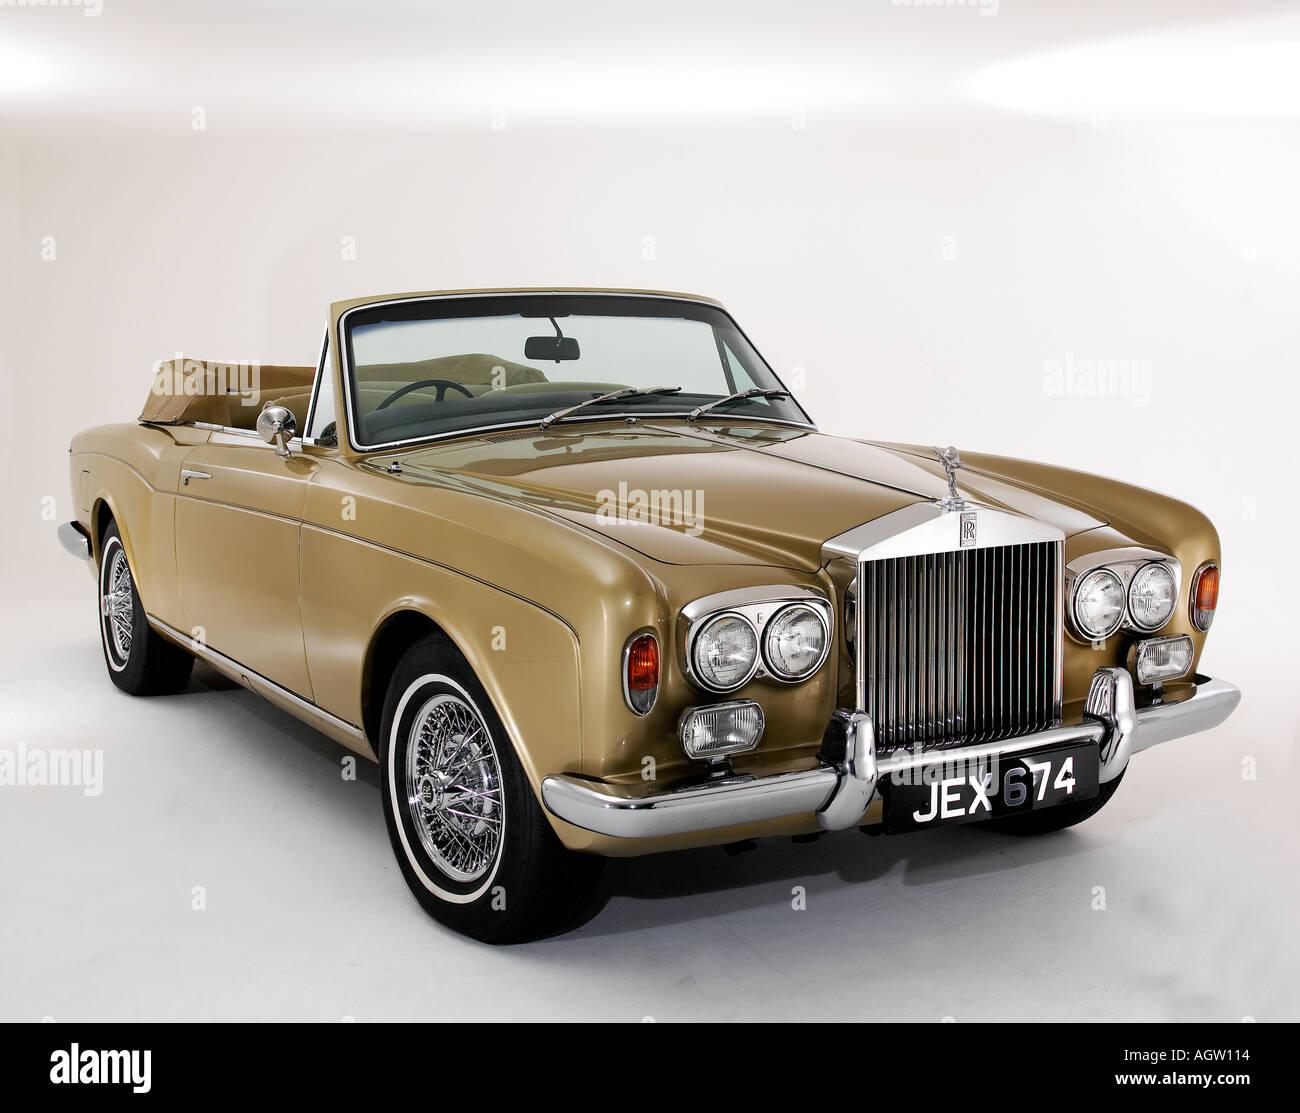 1975 Rolls Royce Corniche convertible Stock Photo